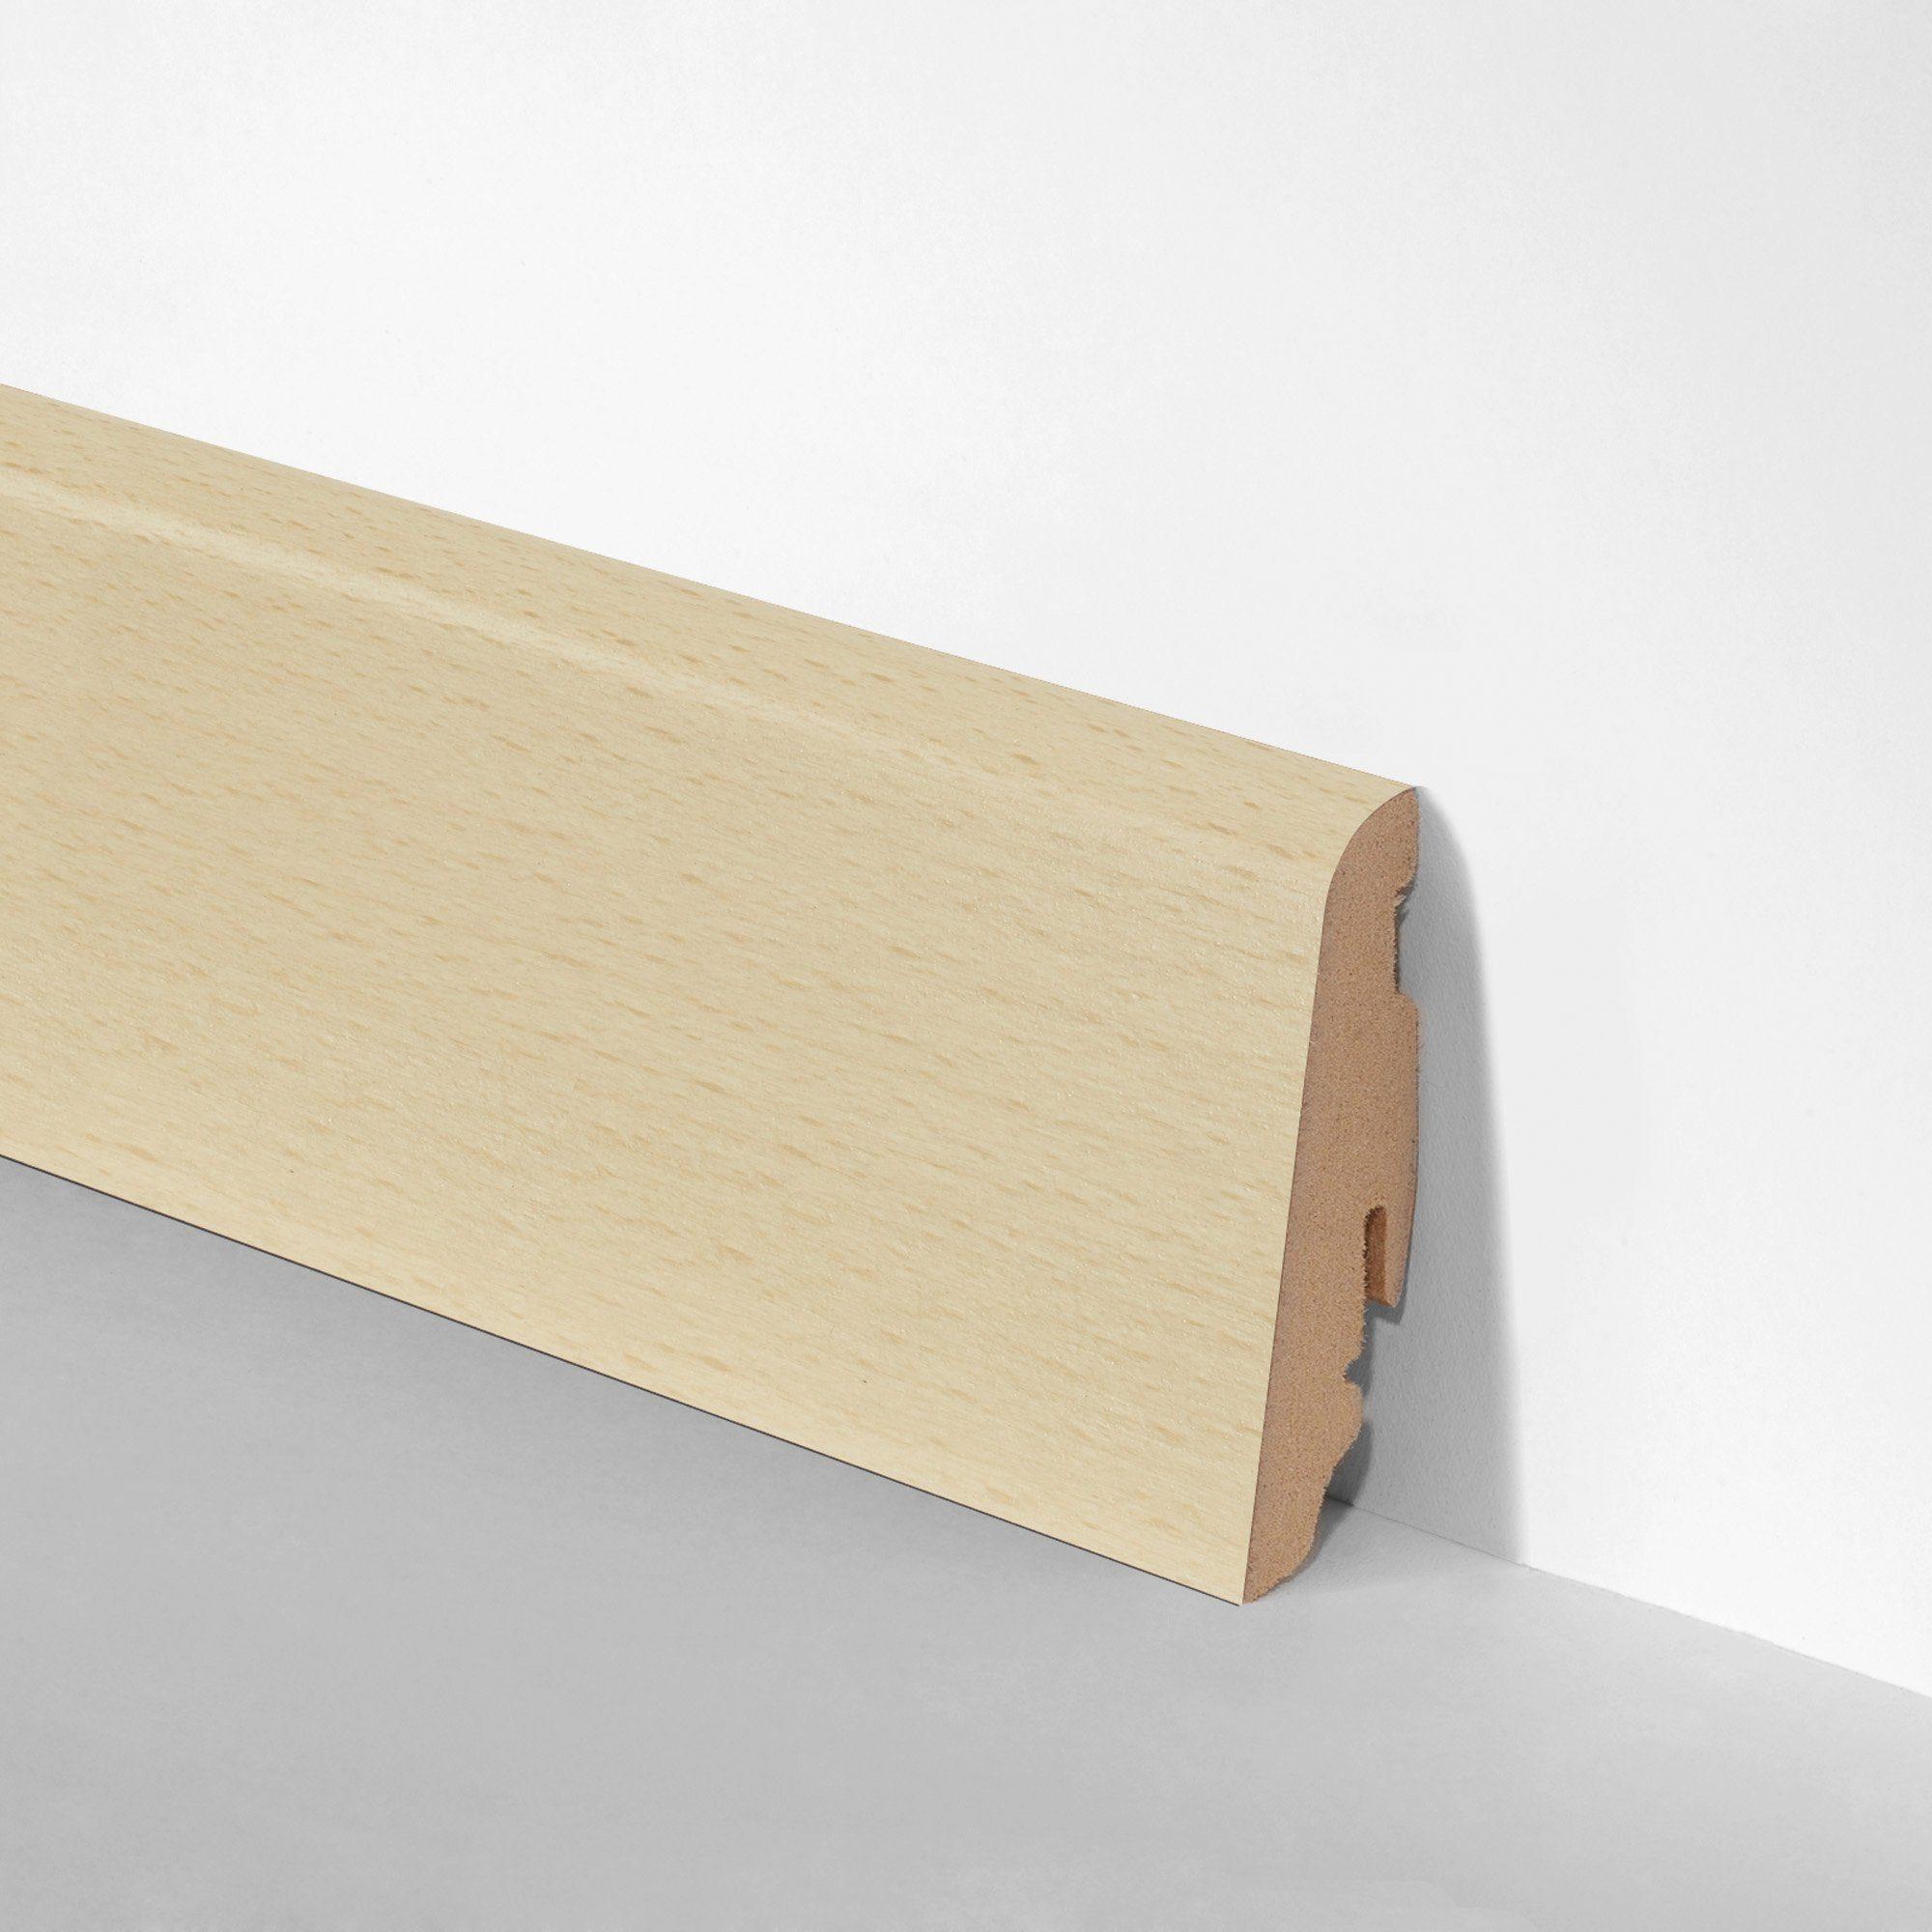 BODENMEISTER Set: Sockelleiste »Echtholz furniert Buche«, 3er-Pack, Höhe: 5,8 cm